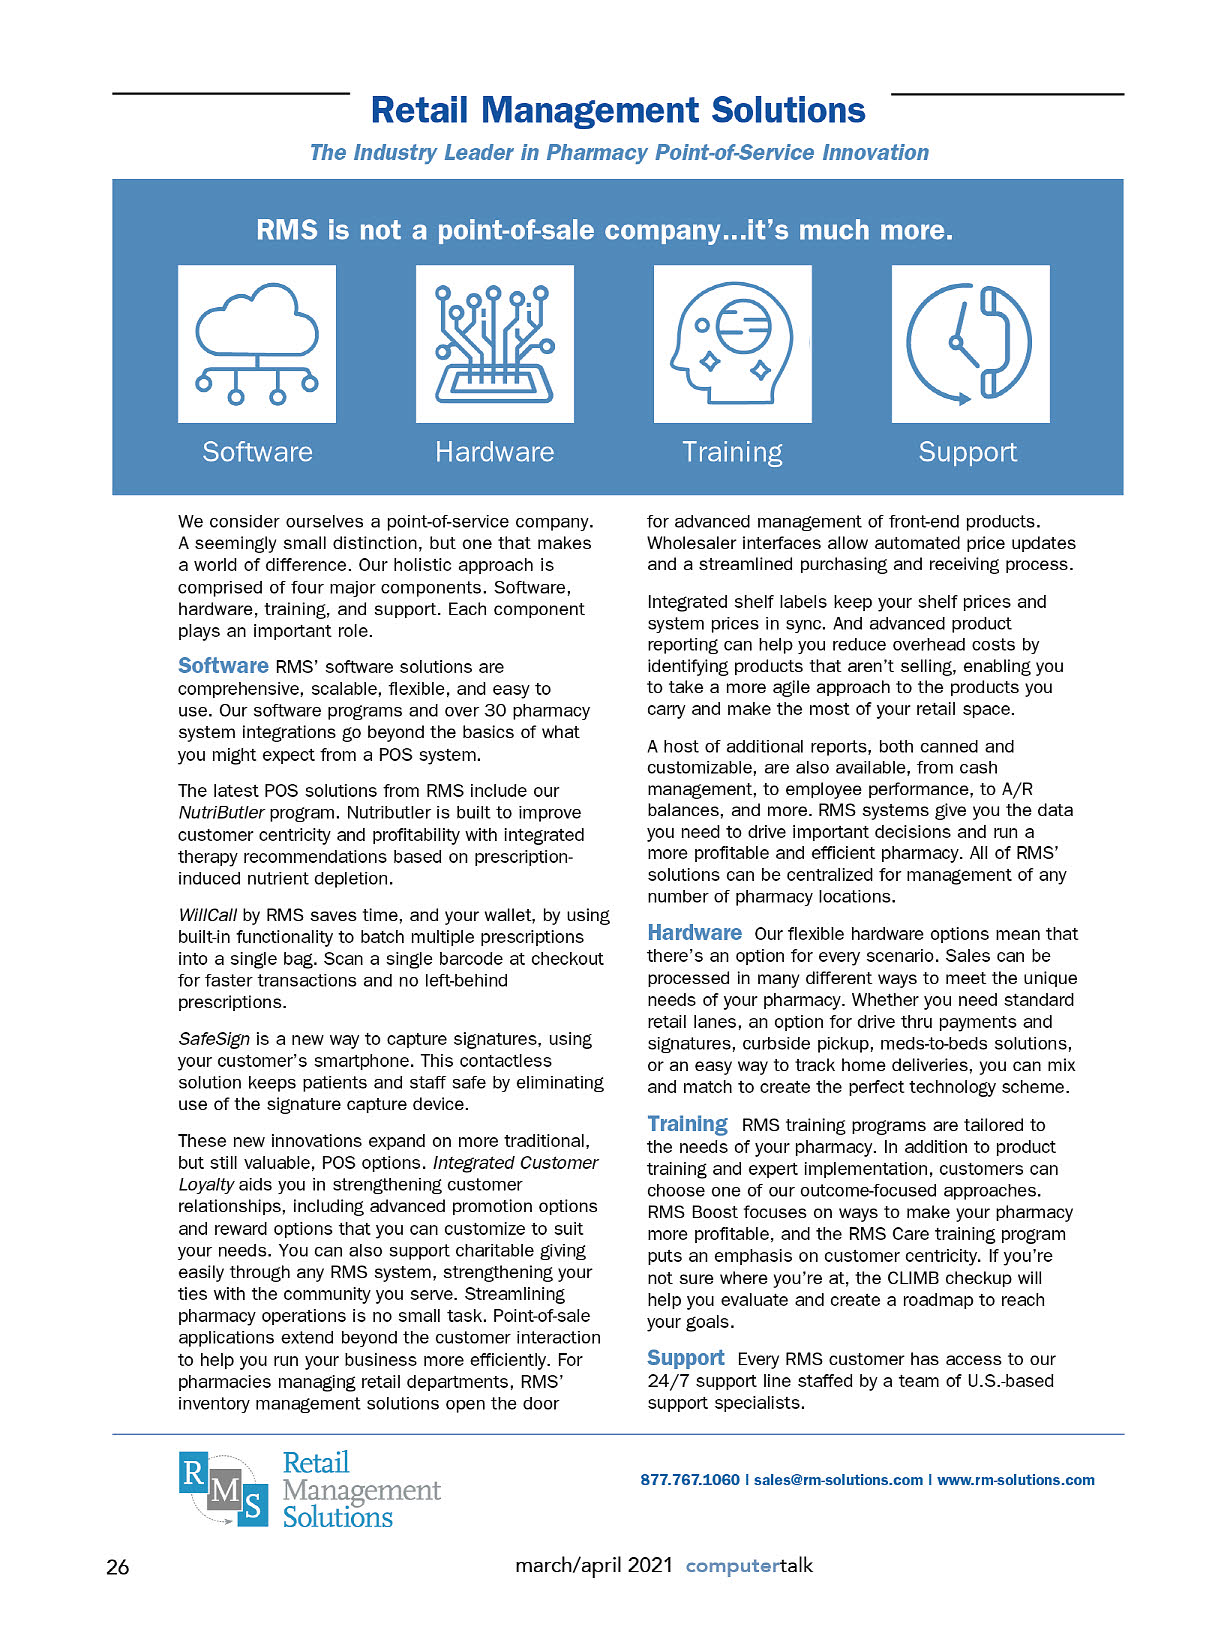 Retail_Management_Solutions_ComputerTalk_Buyers-Guide_MarchApril_2021_26